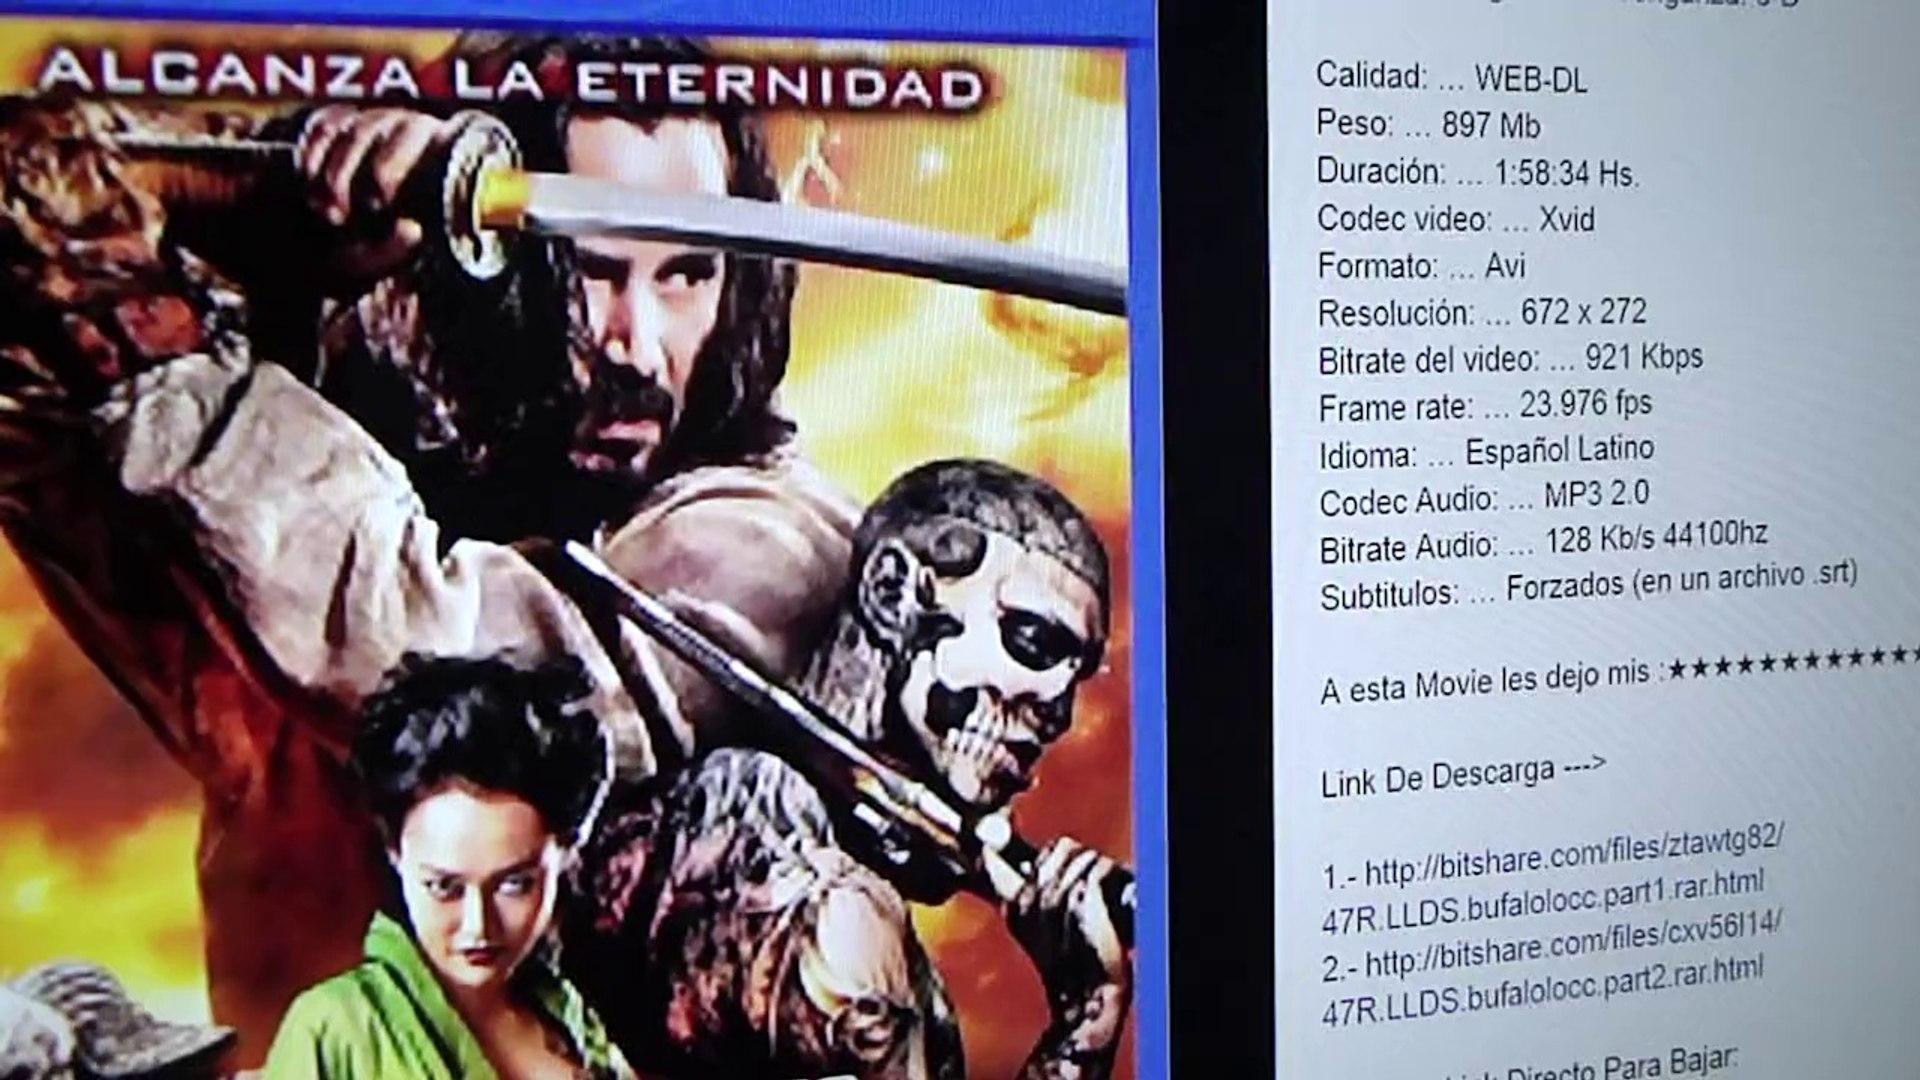 47 RONIN: LA LEYENDA DEL SAMURÁI / 47 Ronin - [2013] [Audio Latino] [BRrip] [2 Link] [BITSHARE] [BIL